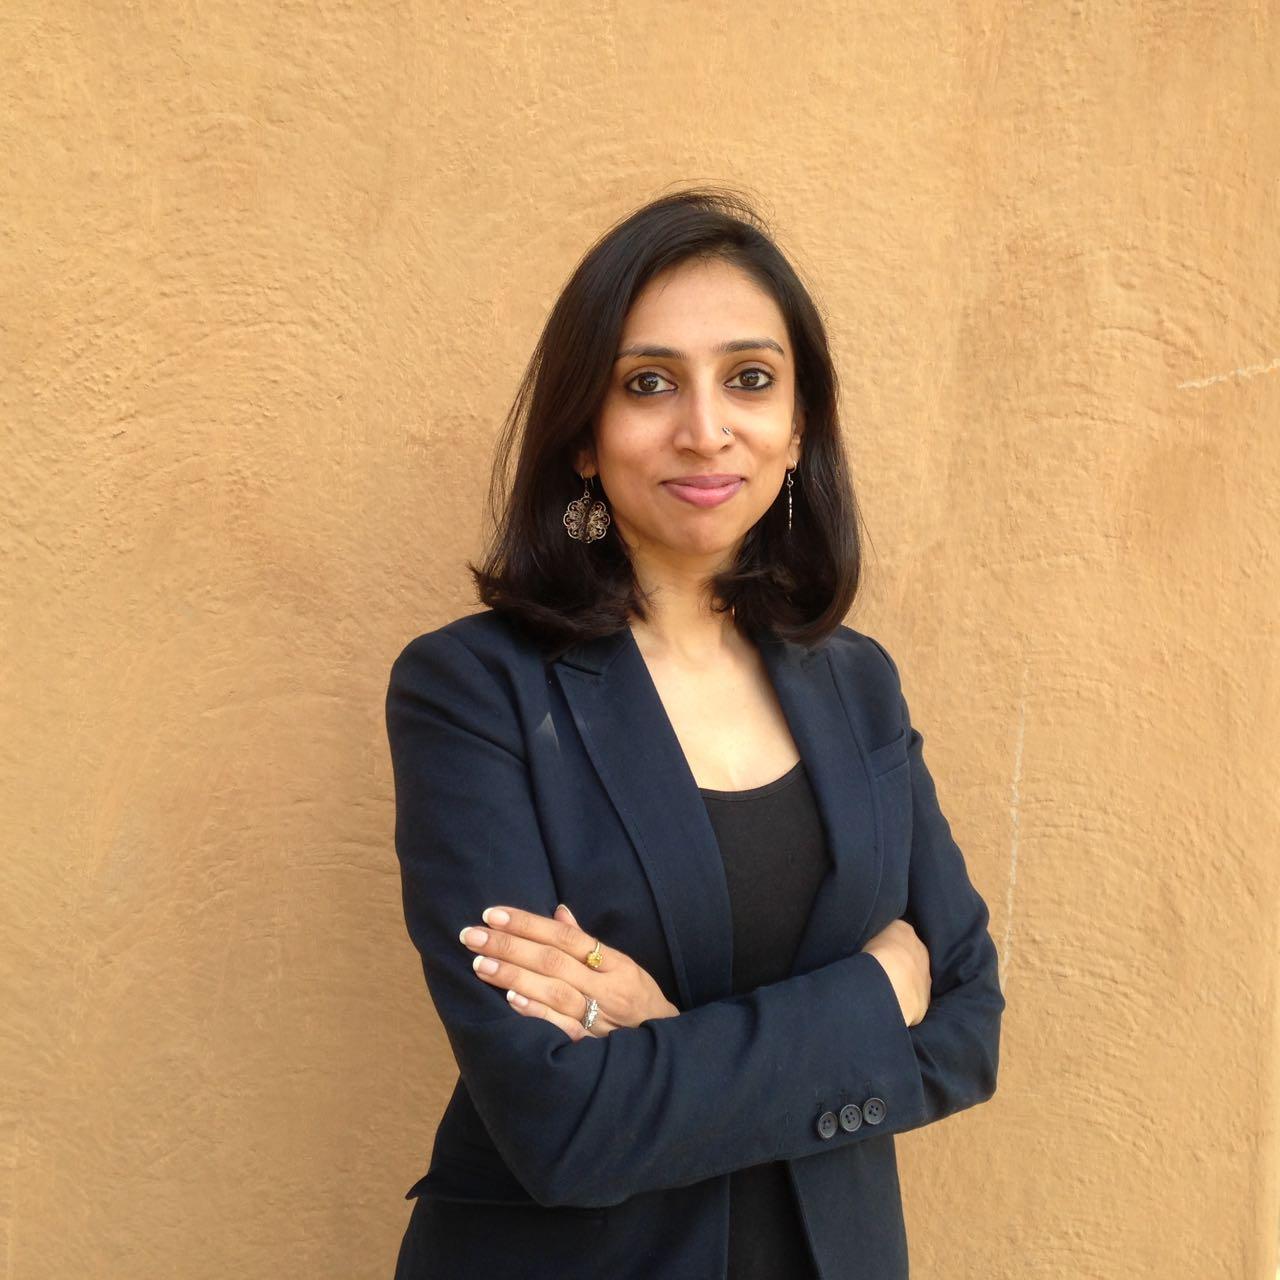 Shubhra Mittal